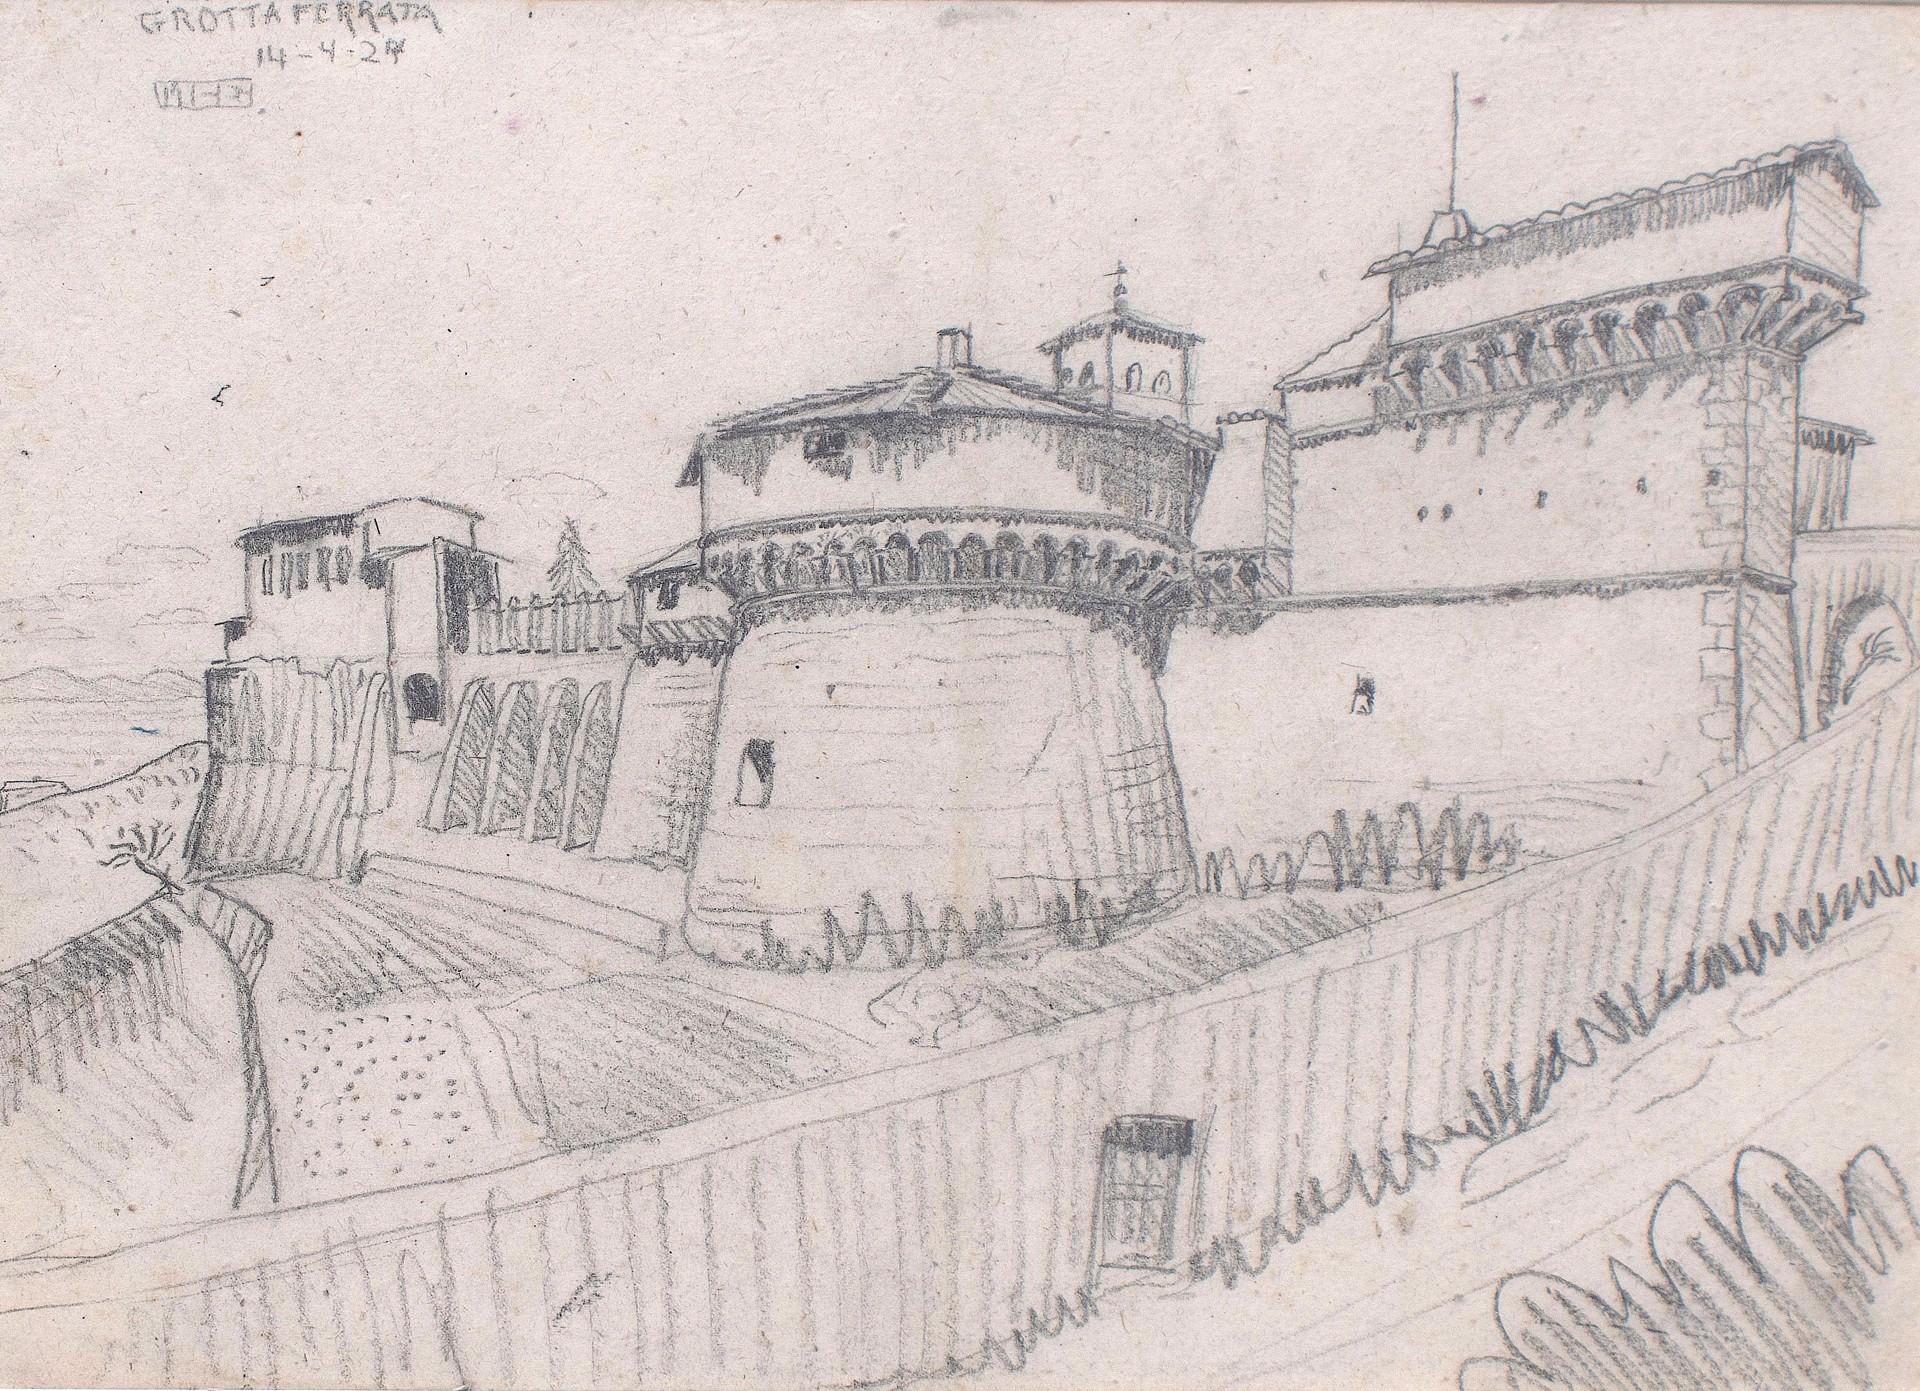 Grotta Ferrata (Castle) by M.C. Escher